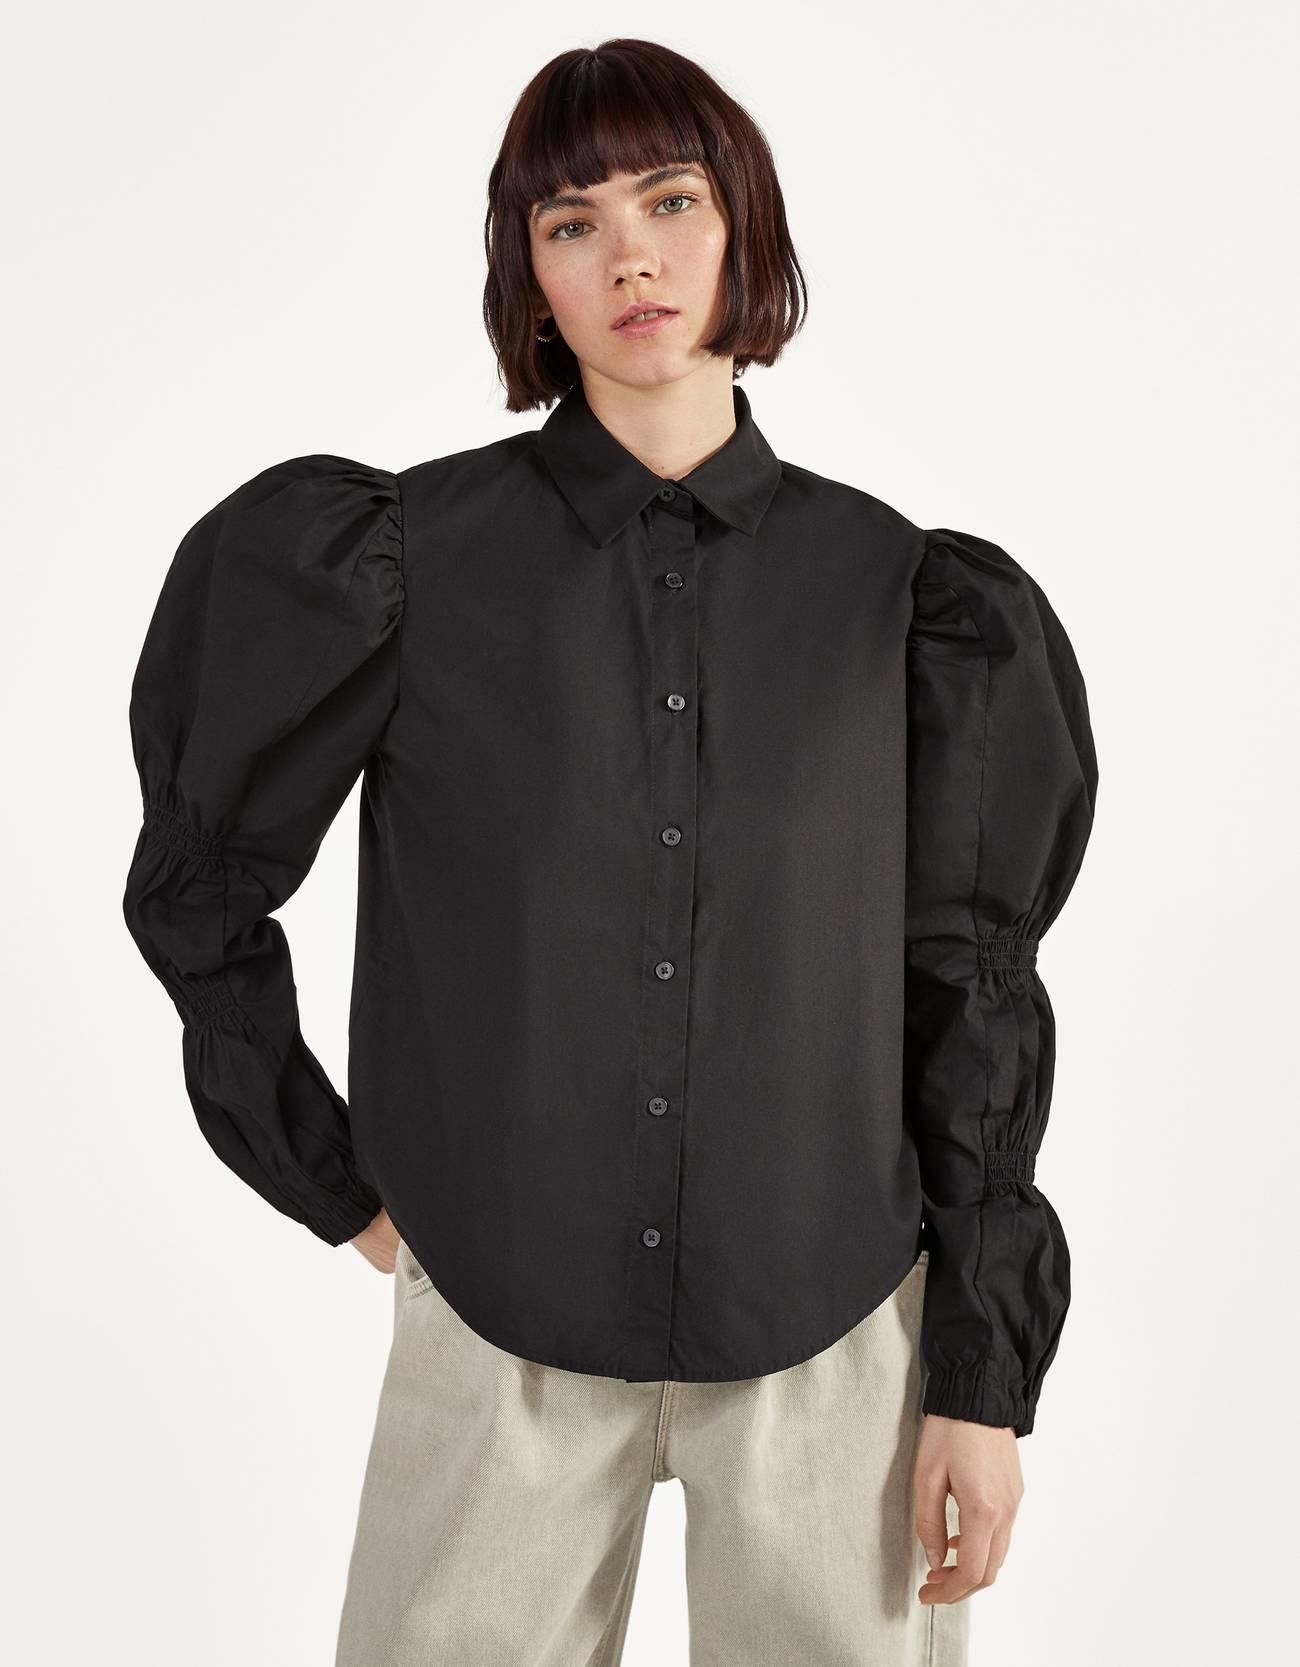 Camisa con mangas abullonadas